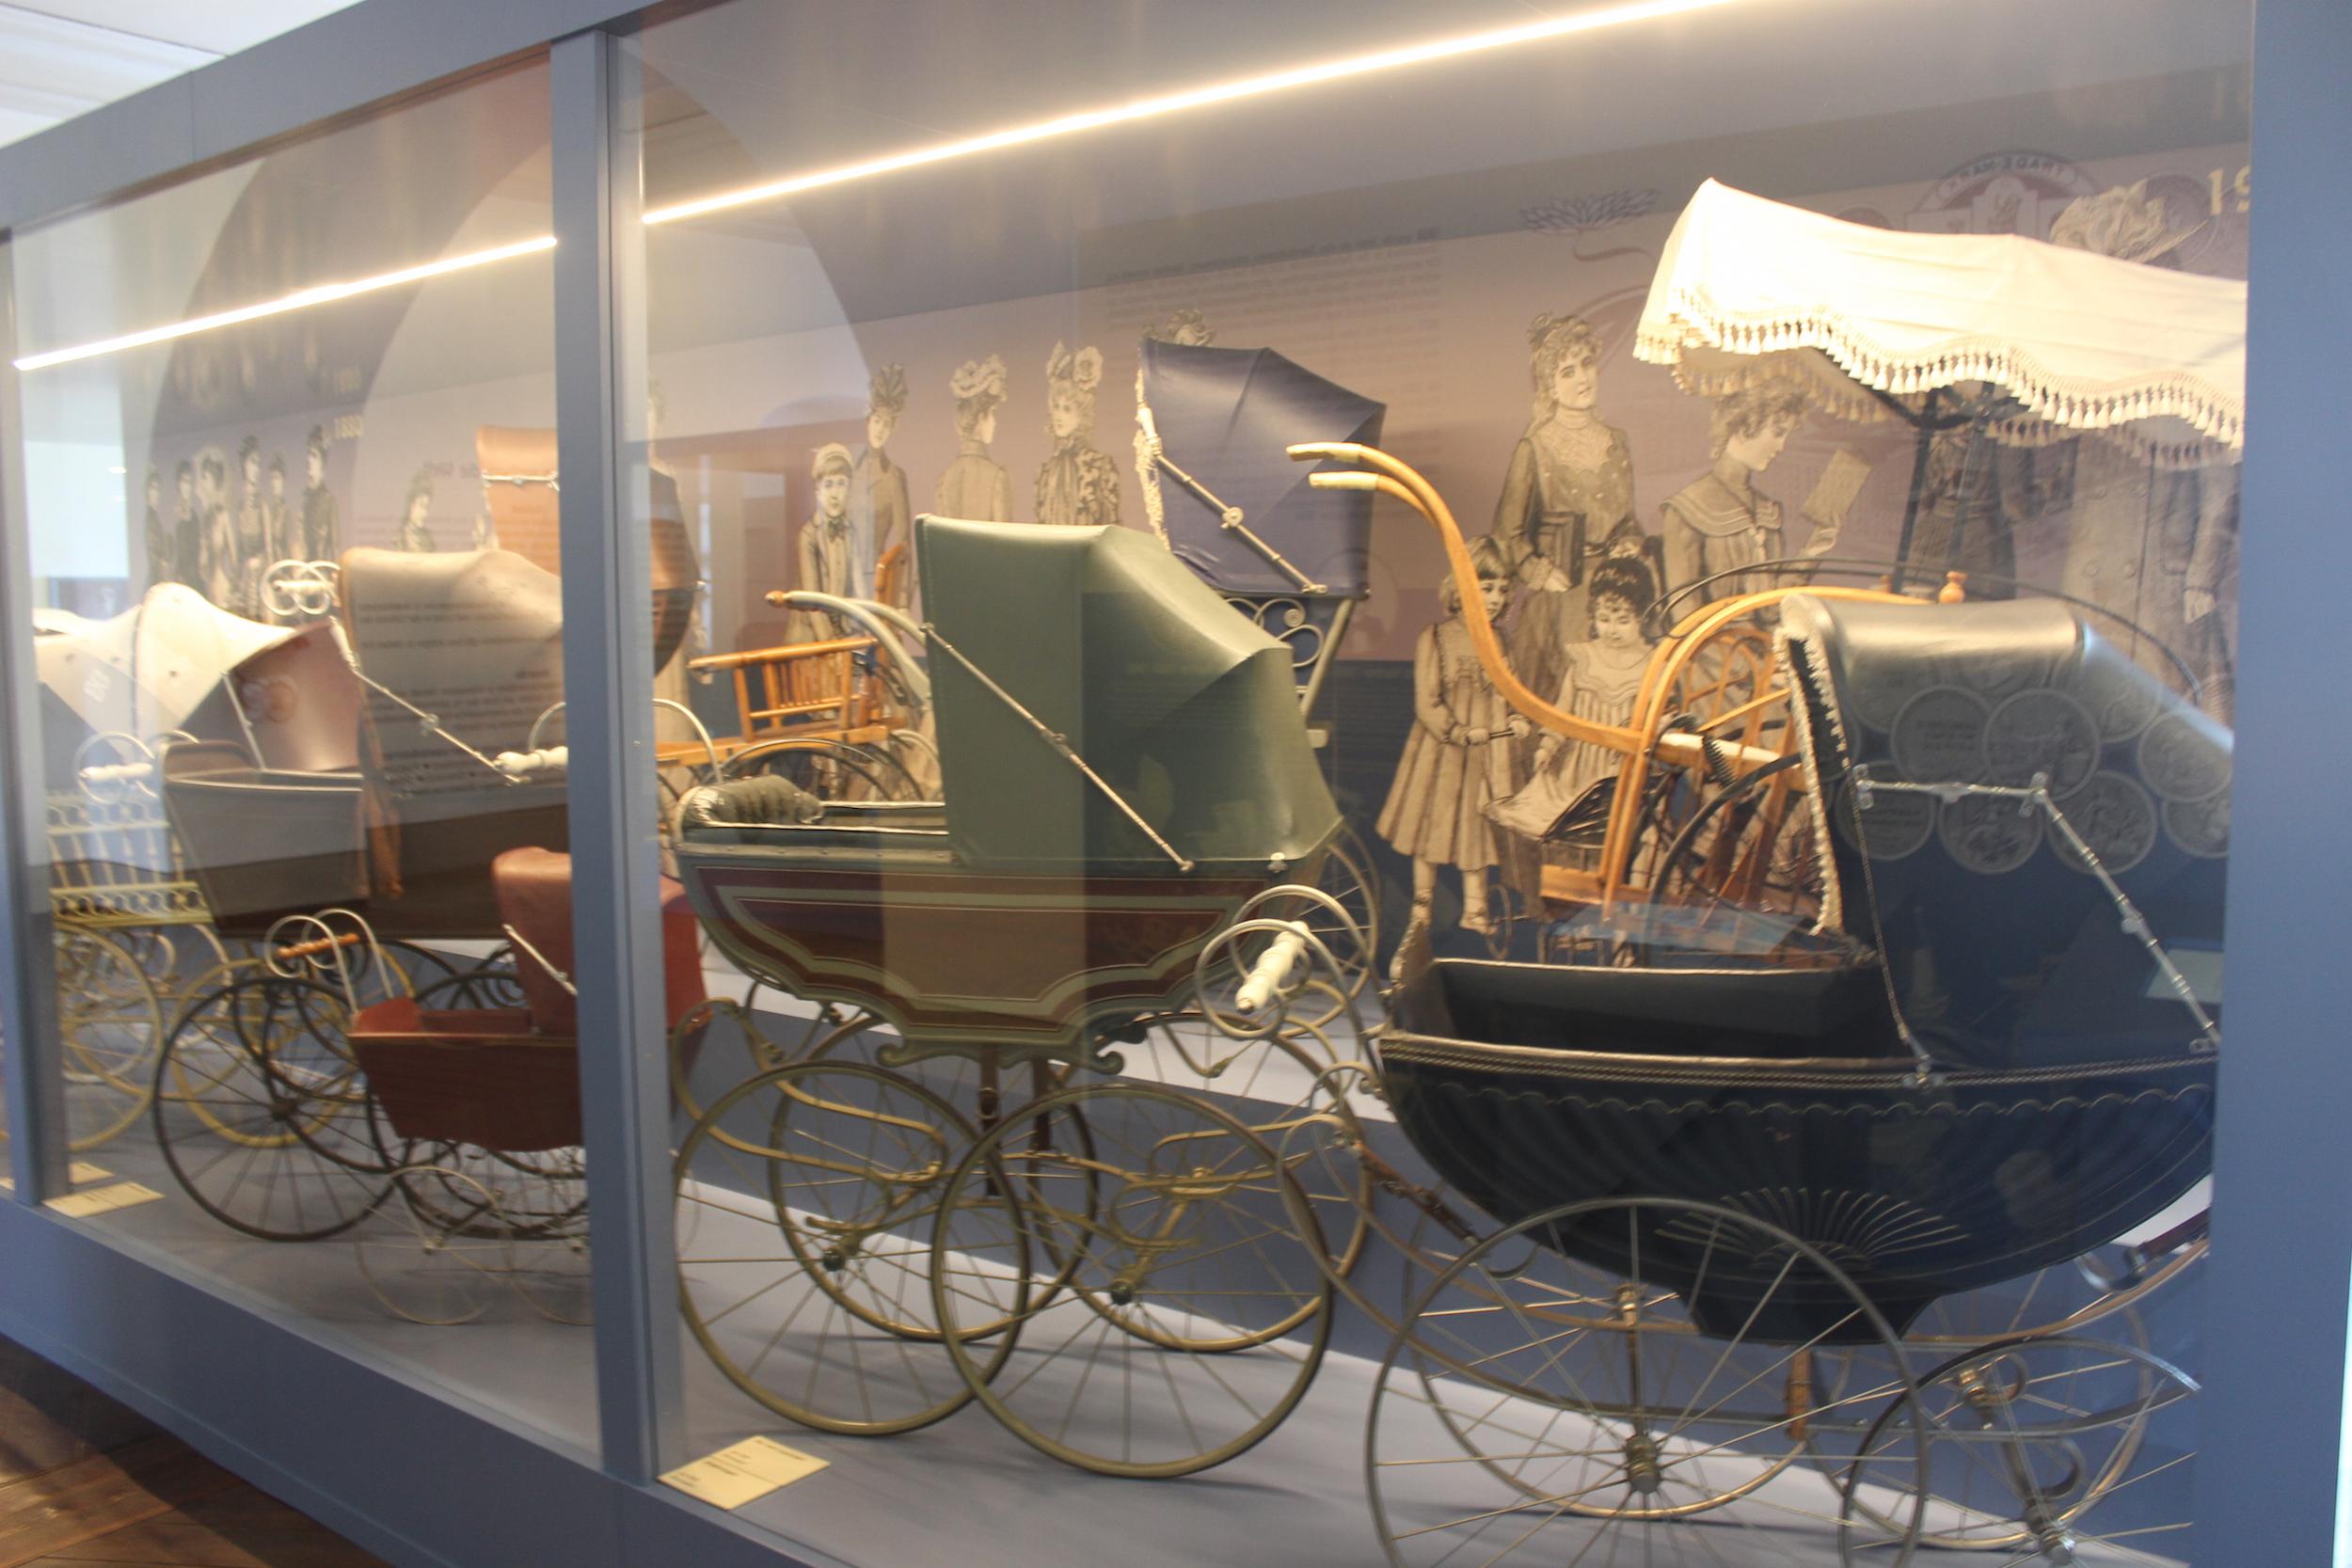 Nostalgie Kinderwagen  Nostalgie Kinderwagenverleih